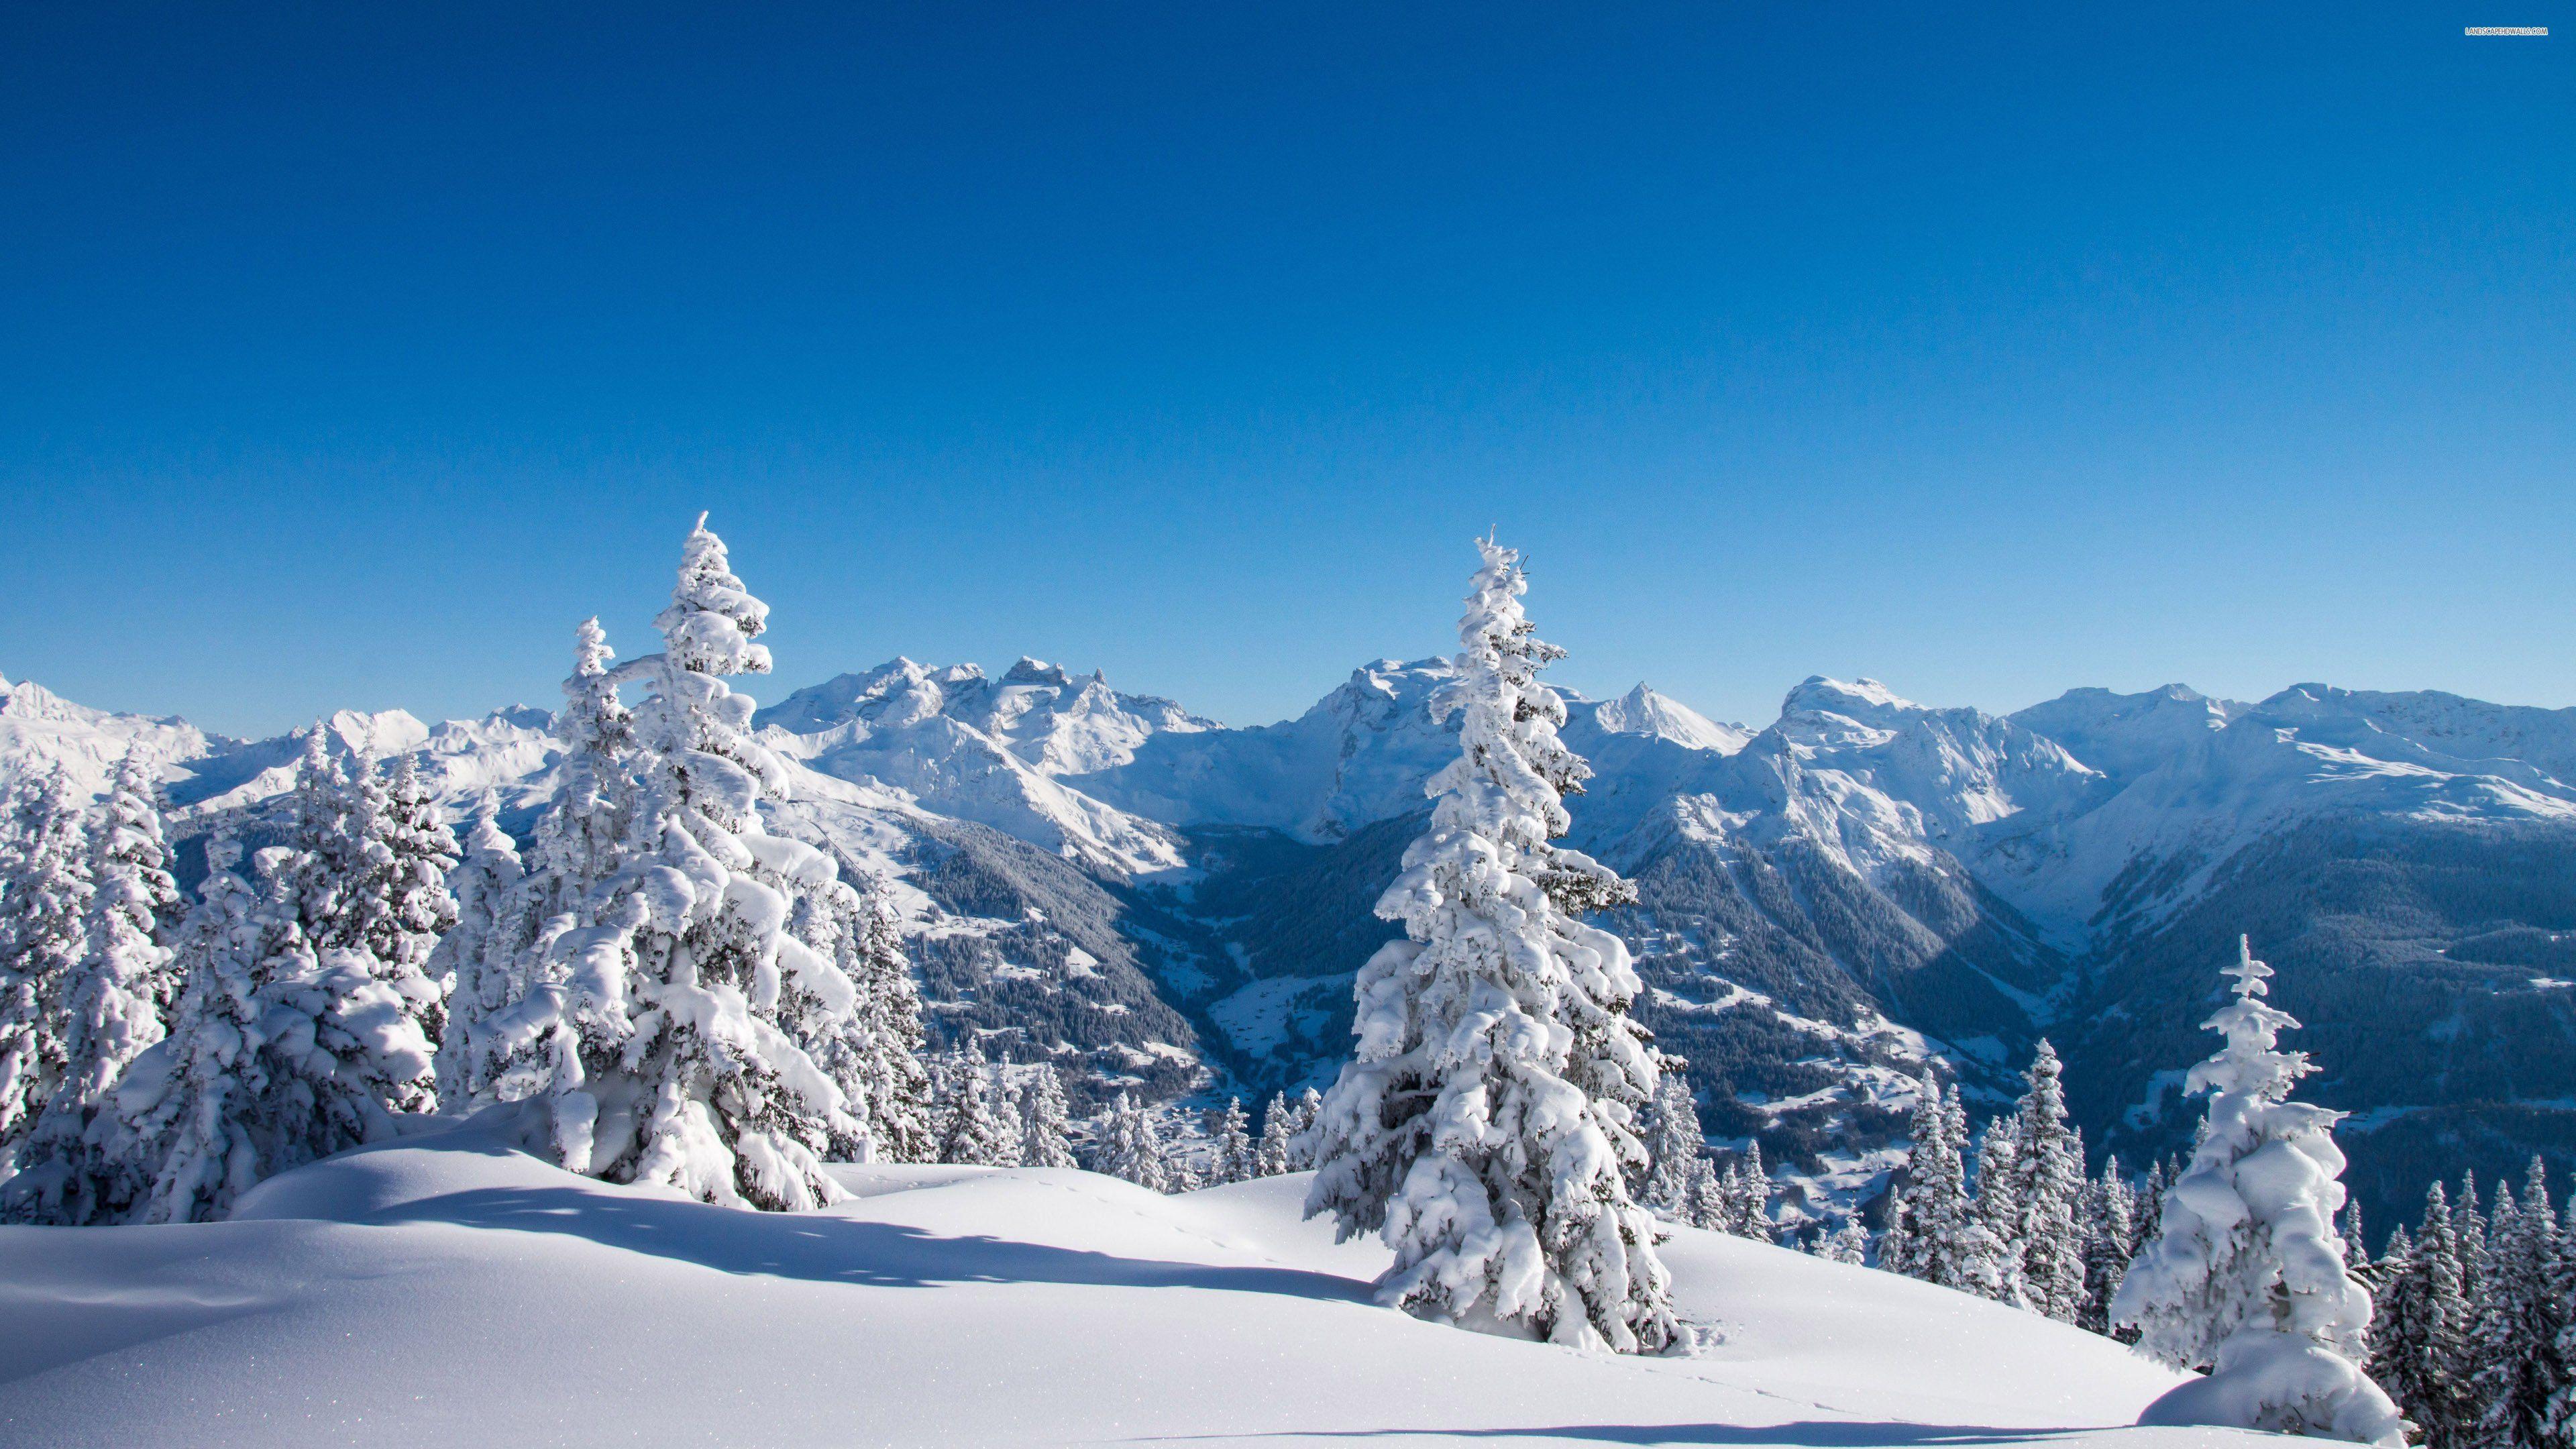 Winter Mountain Desktop Wallpaper HD Winter Mountain